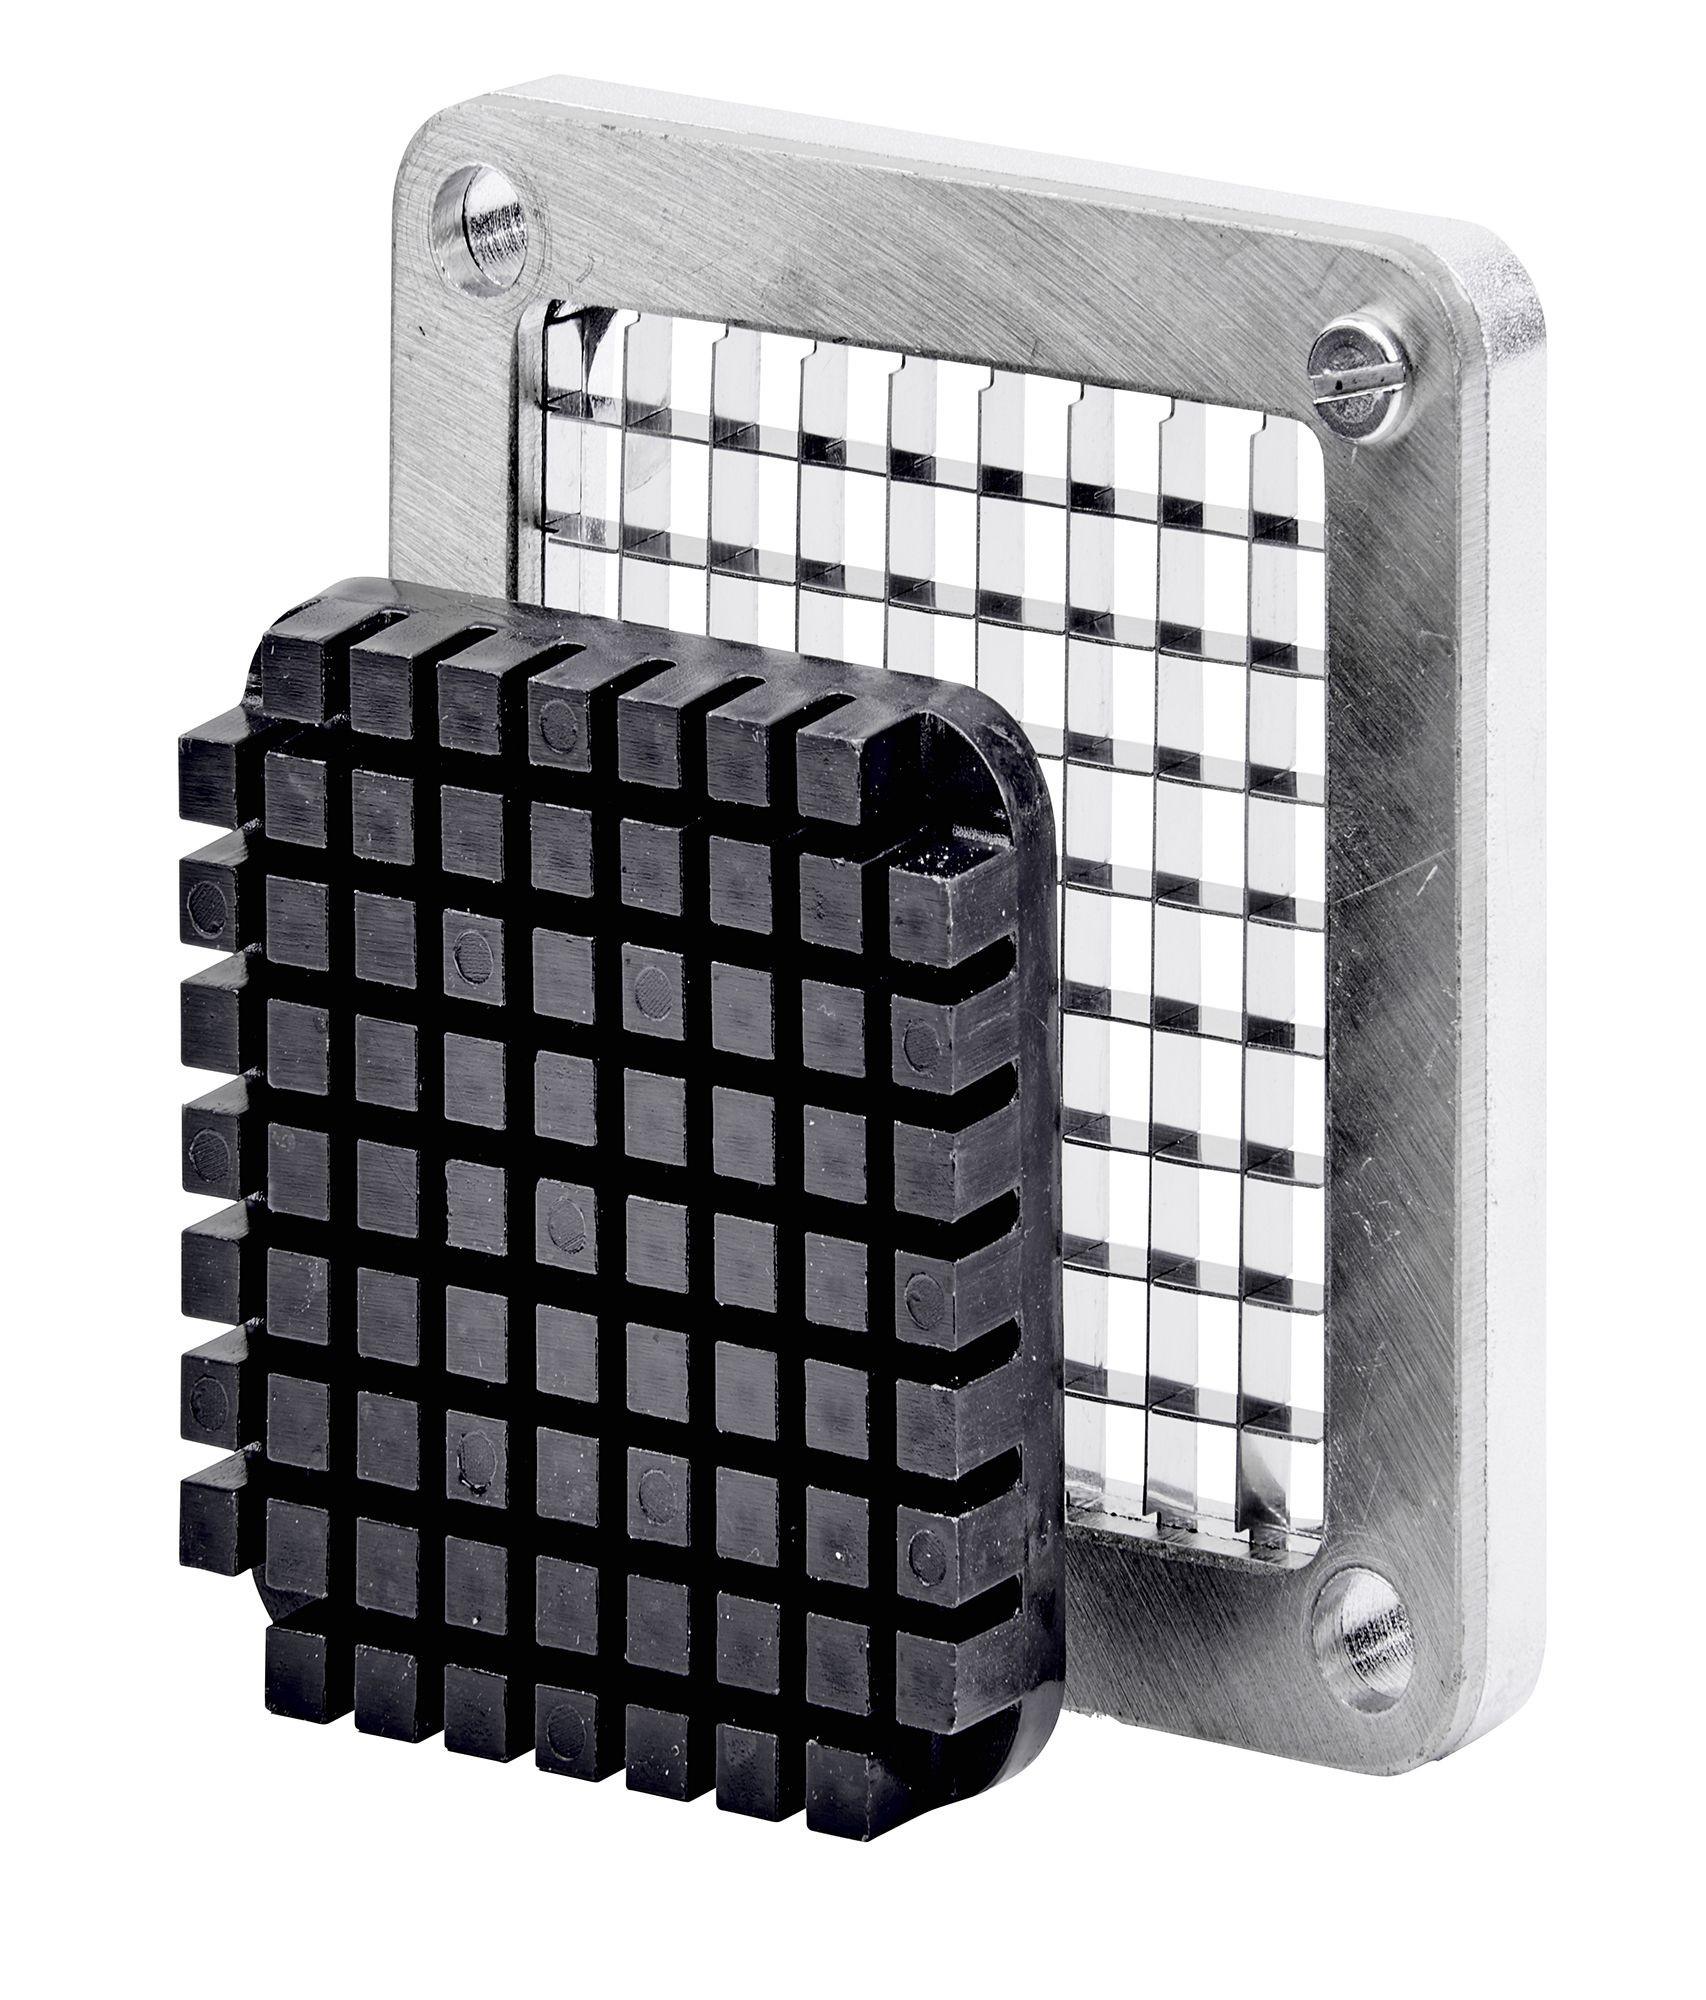 "Winco HCD-375BK 3/8"" Kattex Replacement Blade & Block for HCD- Quick Slice Chopper / Dicer"